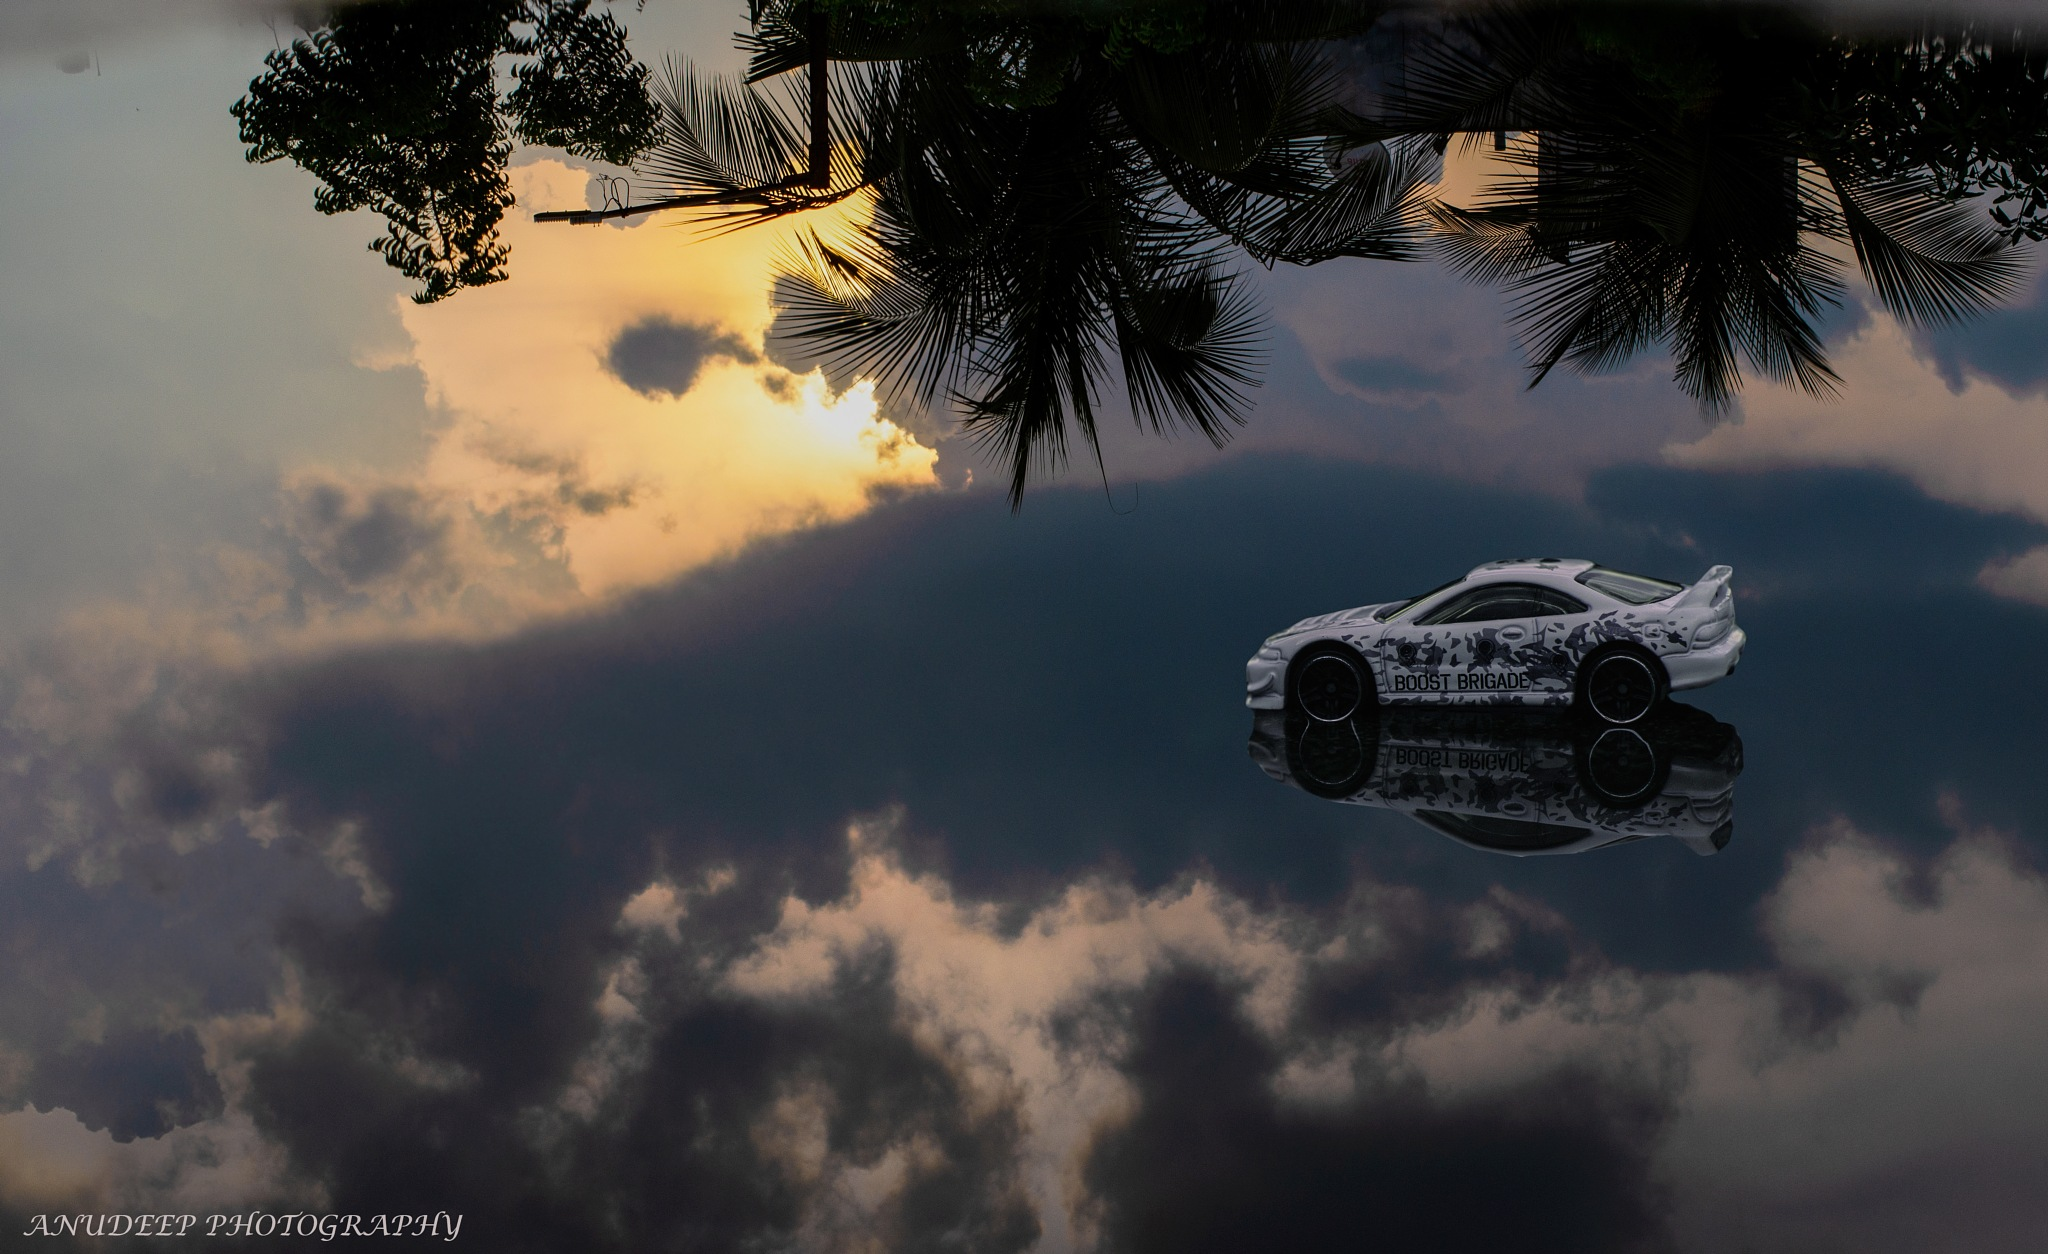 The perfect reflection! by anudeepbalagam